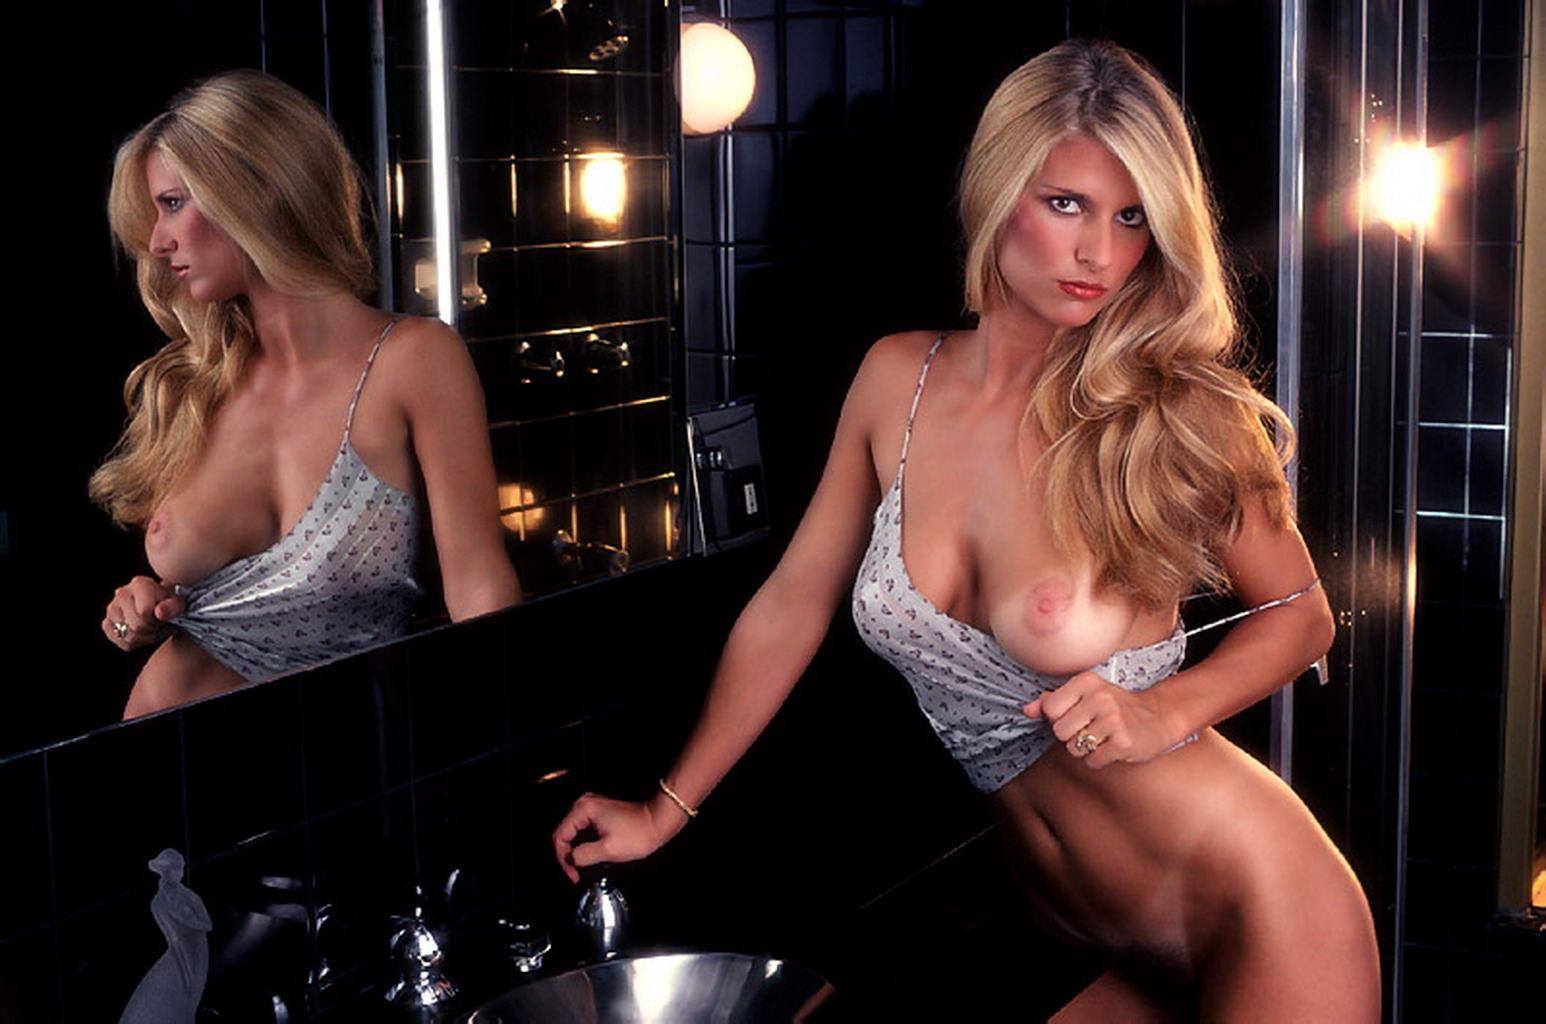 Muscular women nude porn